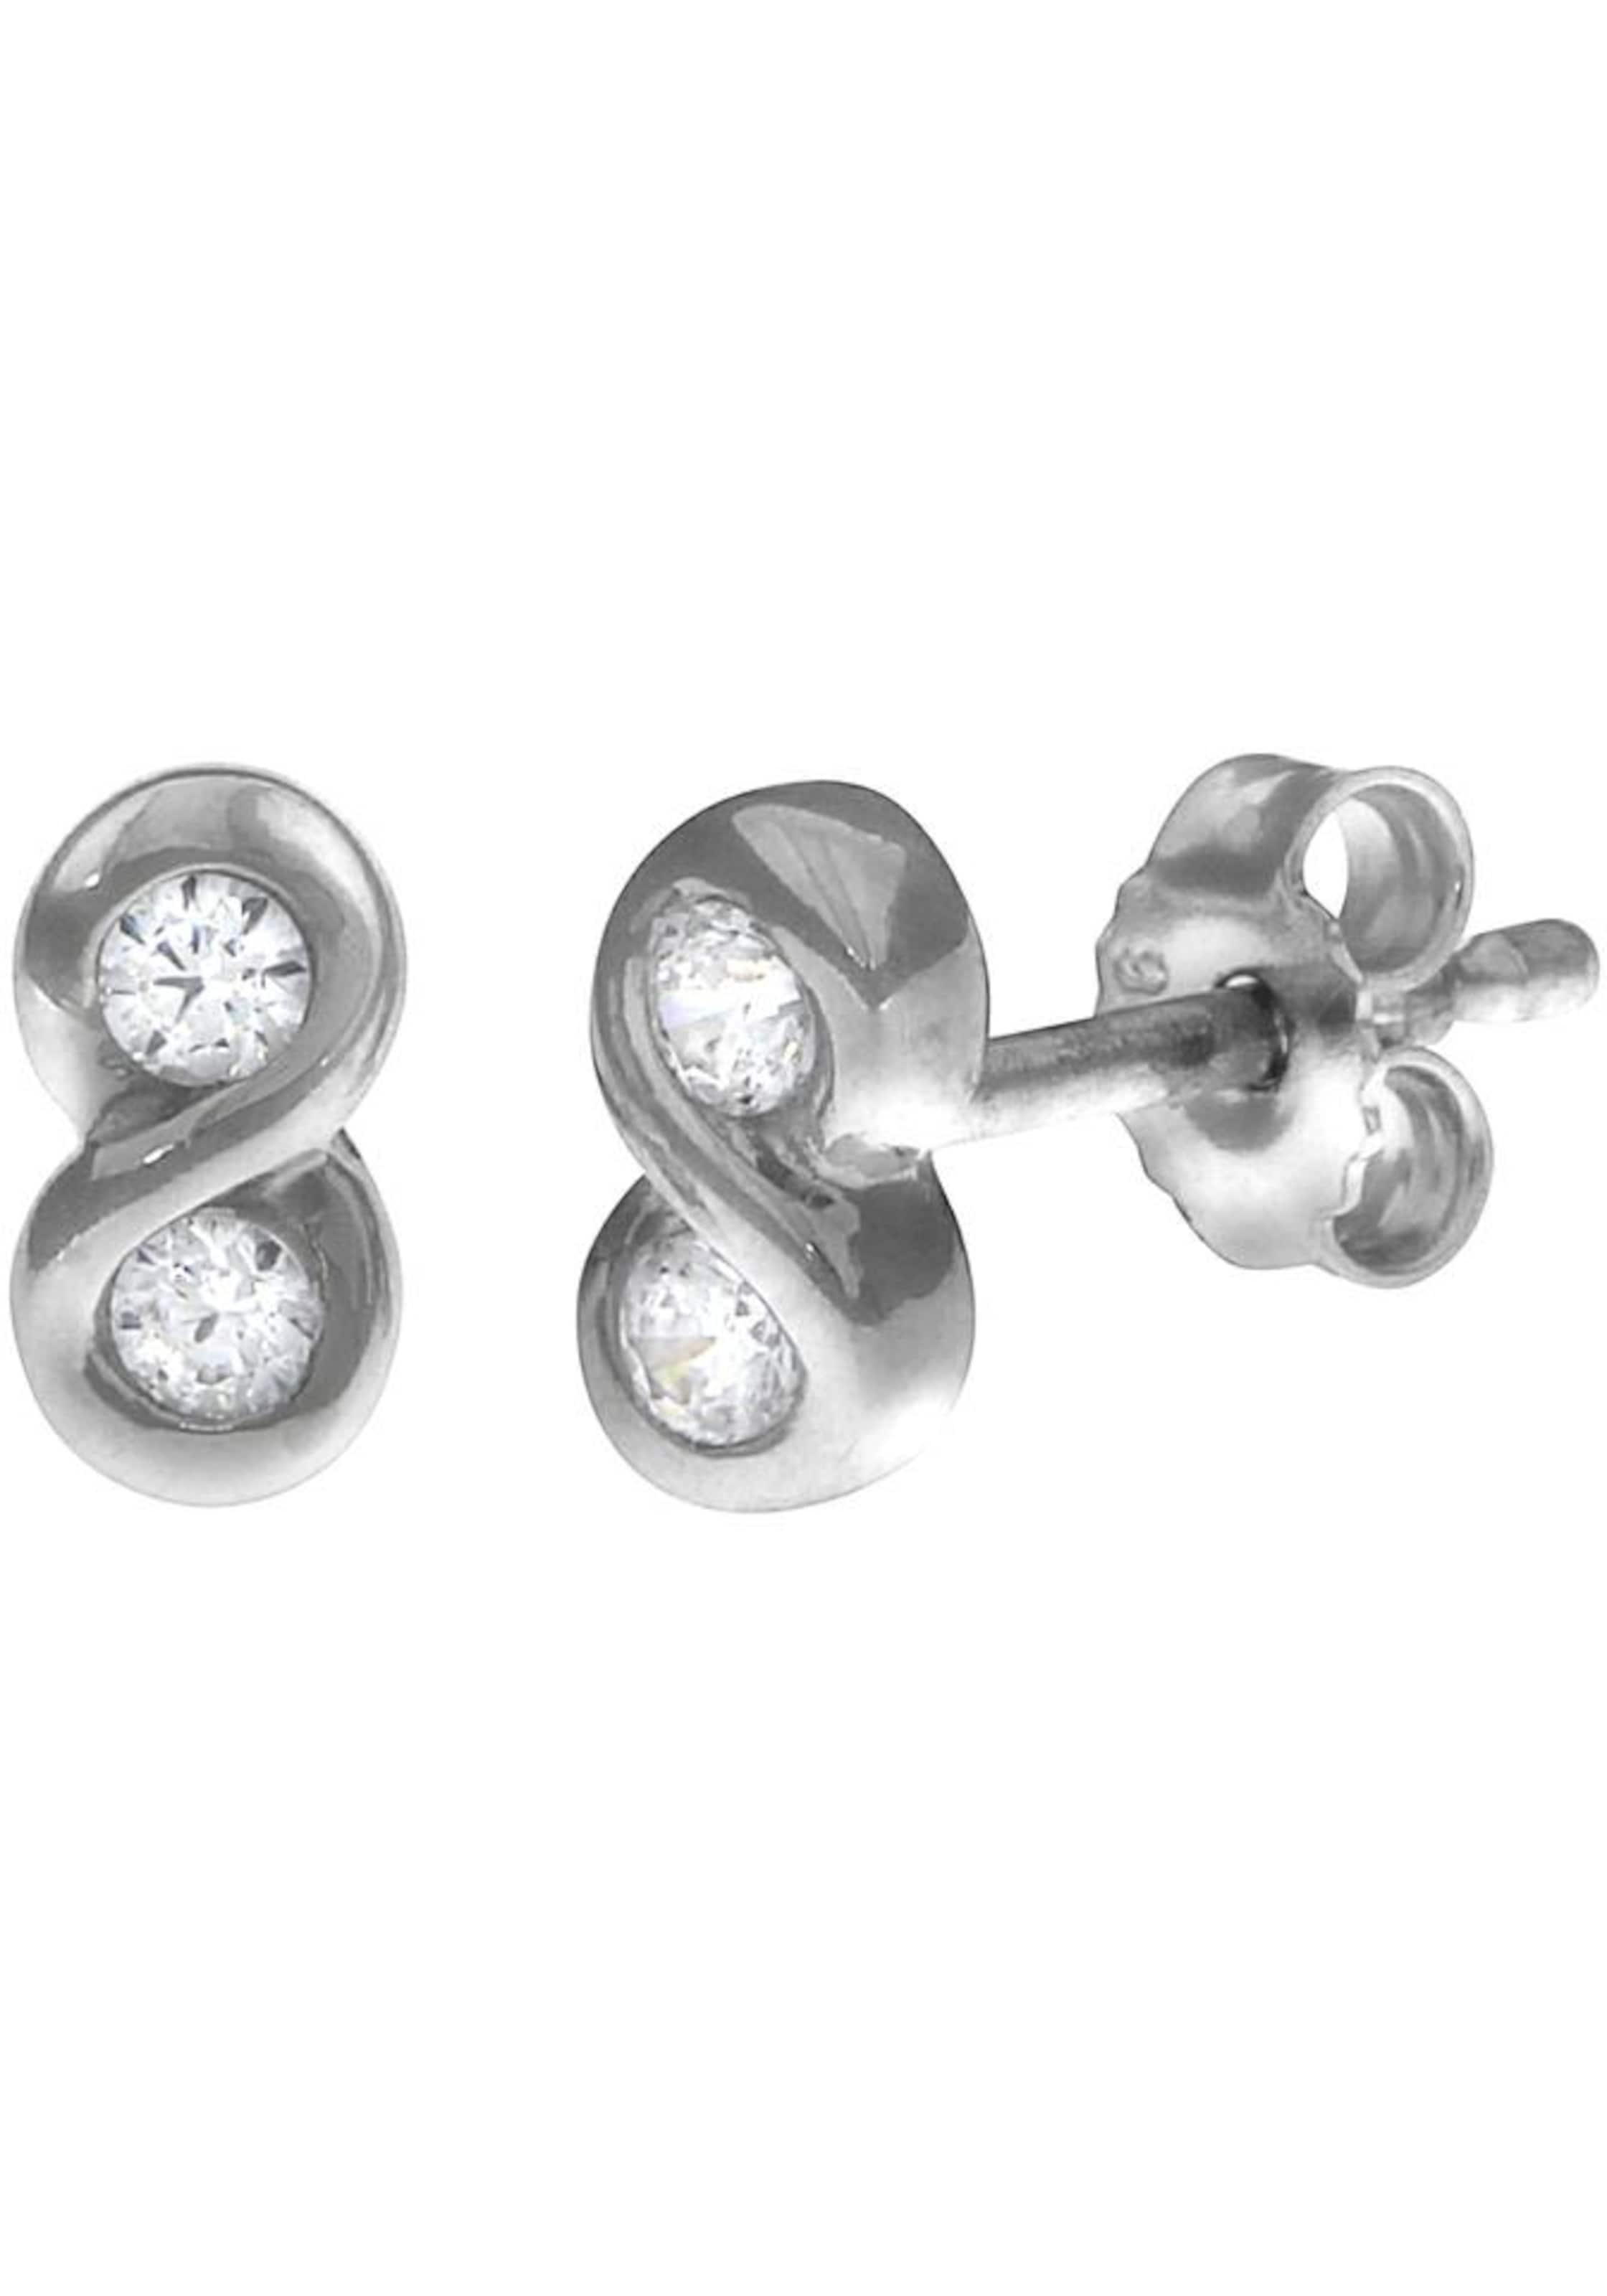 'infinity' Ohrstecker Silber In Paar Firetti 5L4jR3A